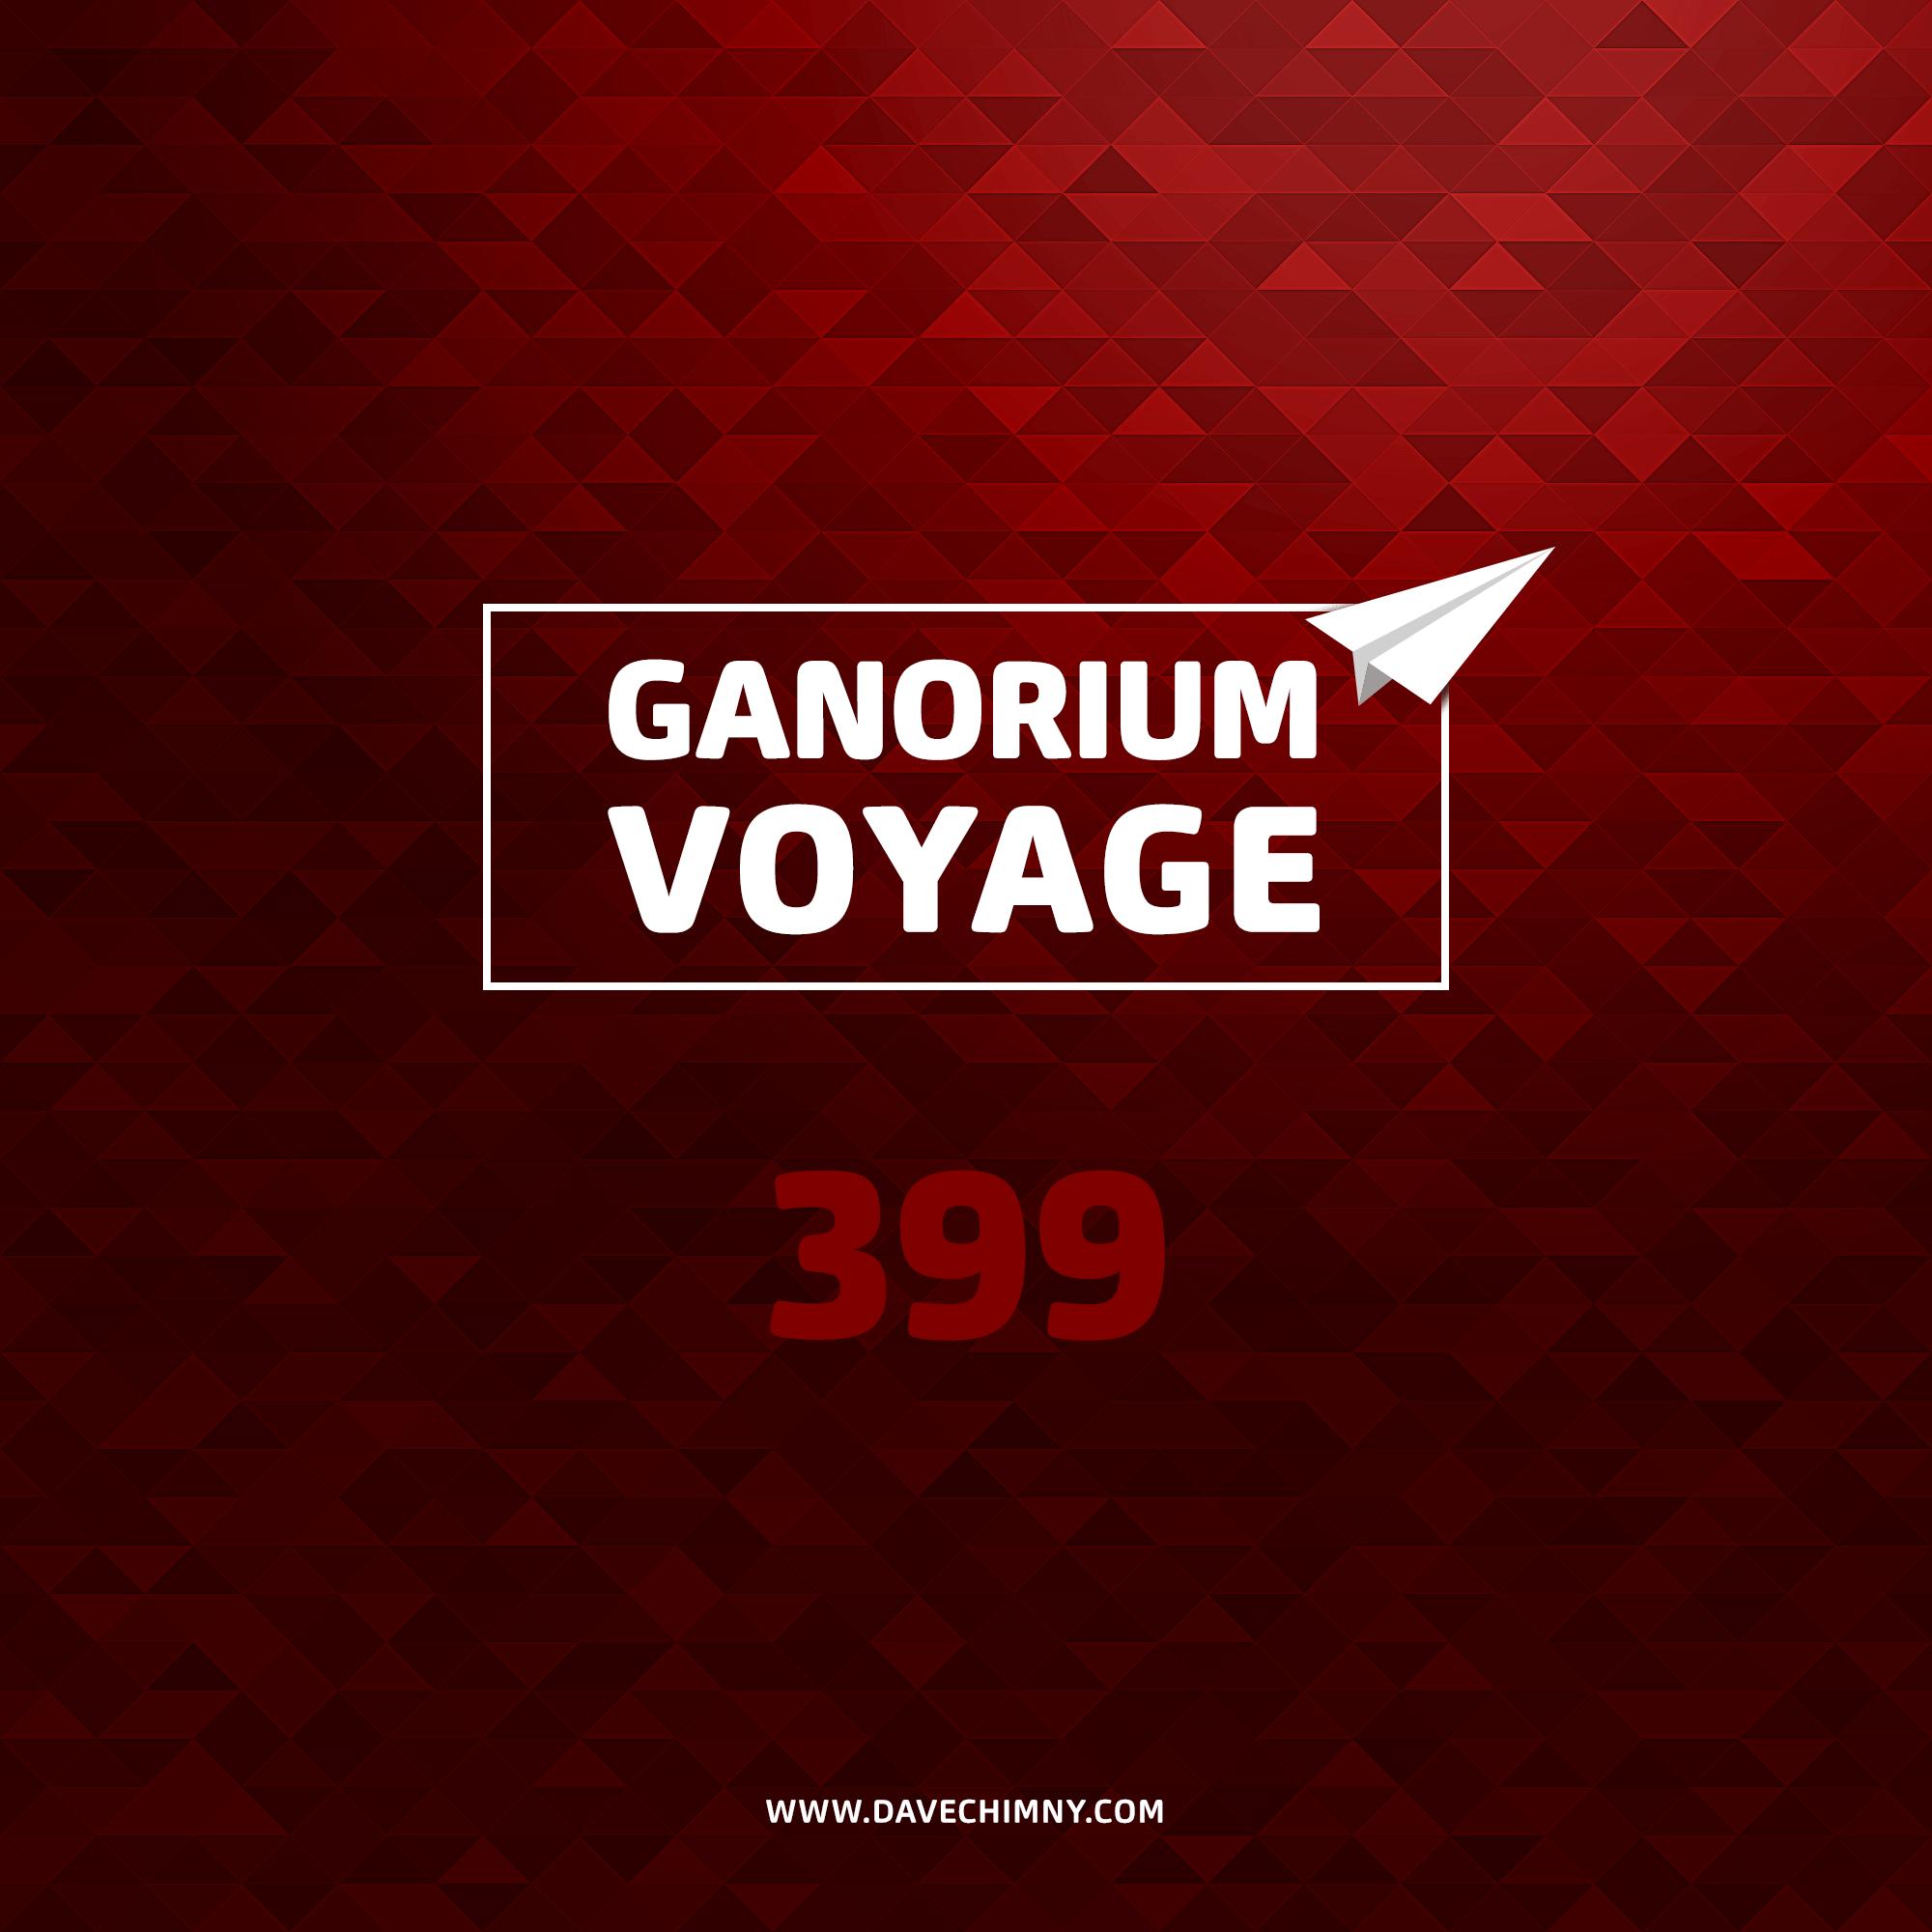 Dave Chimny - Ganorium Voyage 399